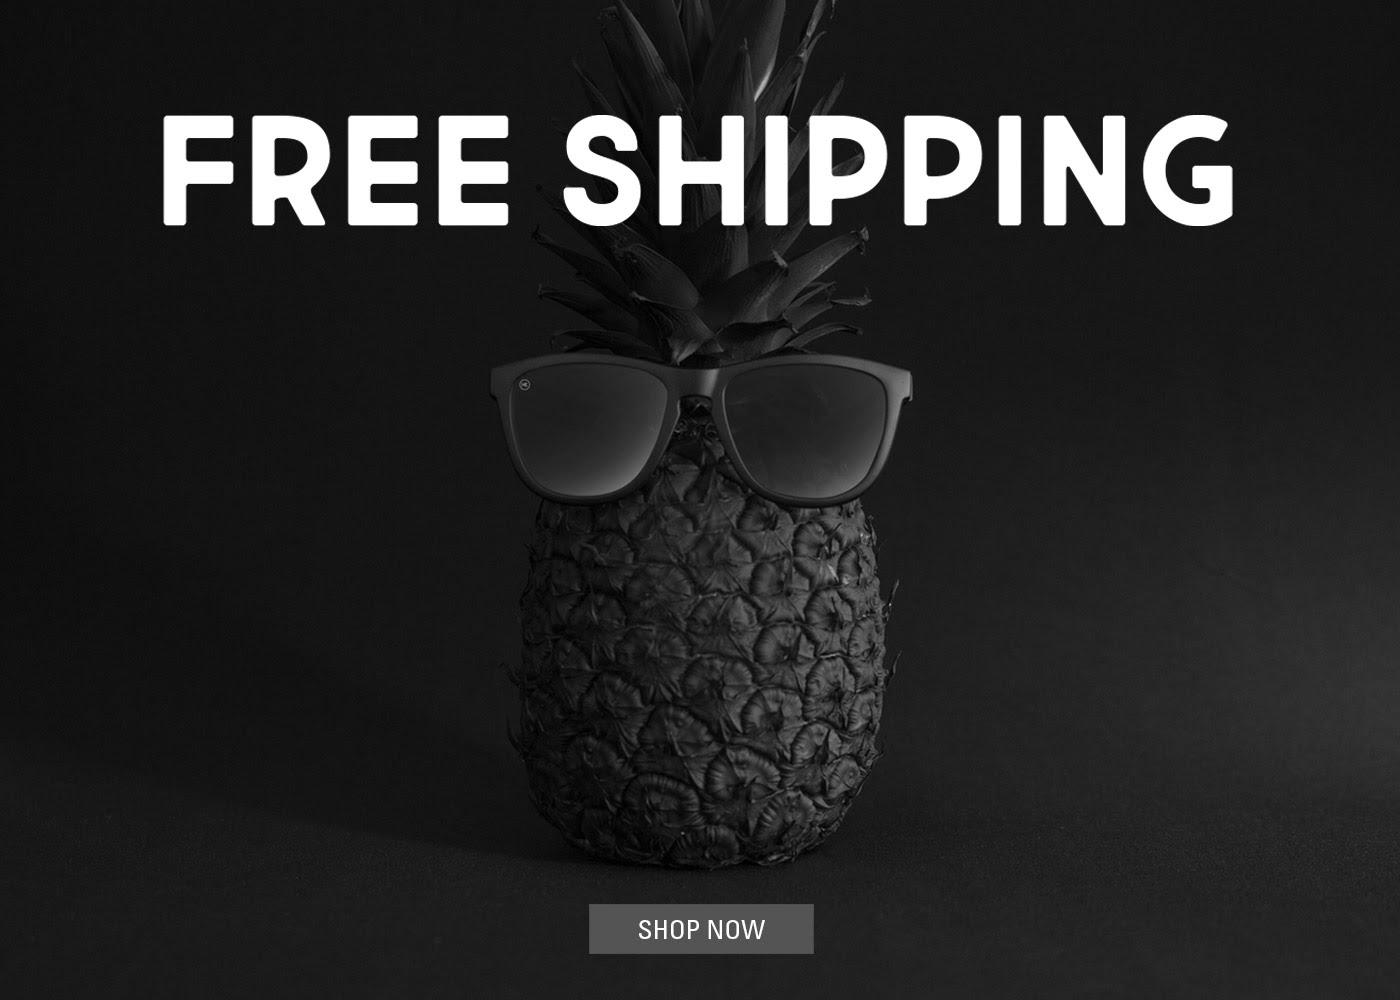 Pre-BF Free Shipping